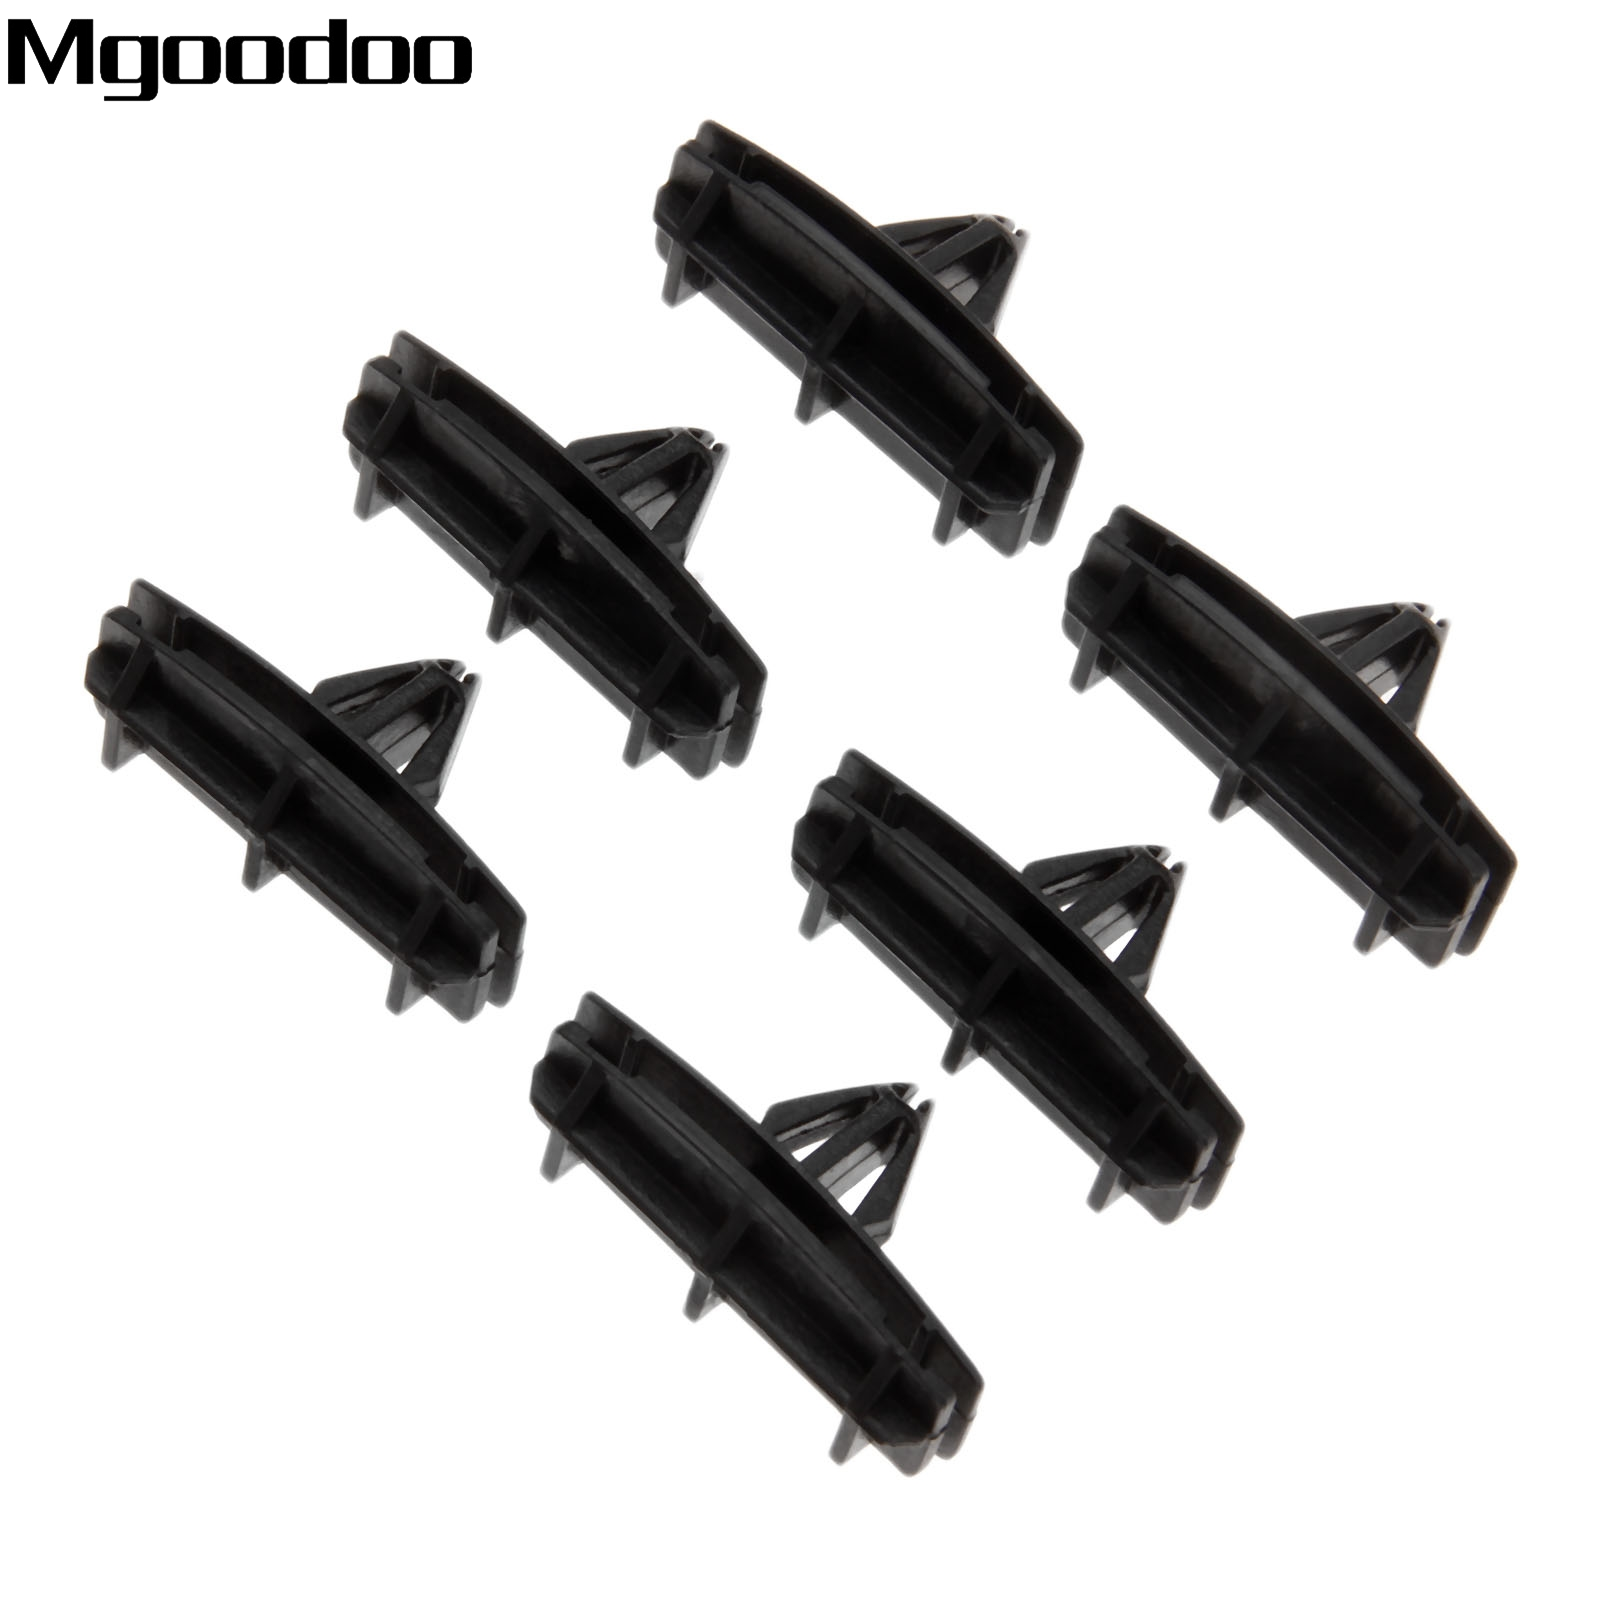 25pcs Door Fender Moulding Clips 68039280-AA For Jeep Wrangler Unlimited JK